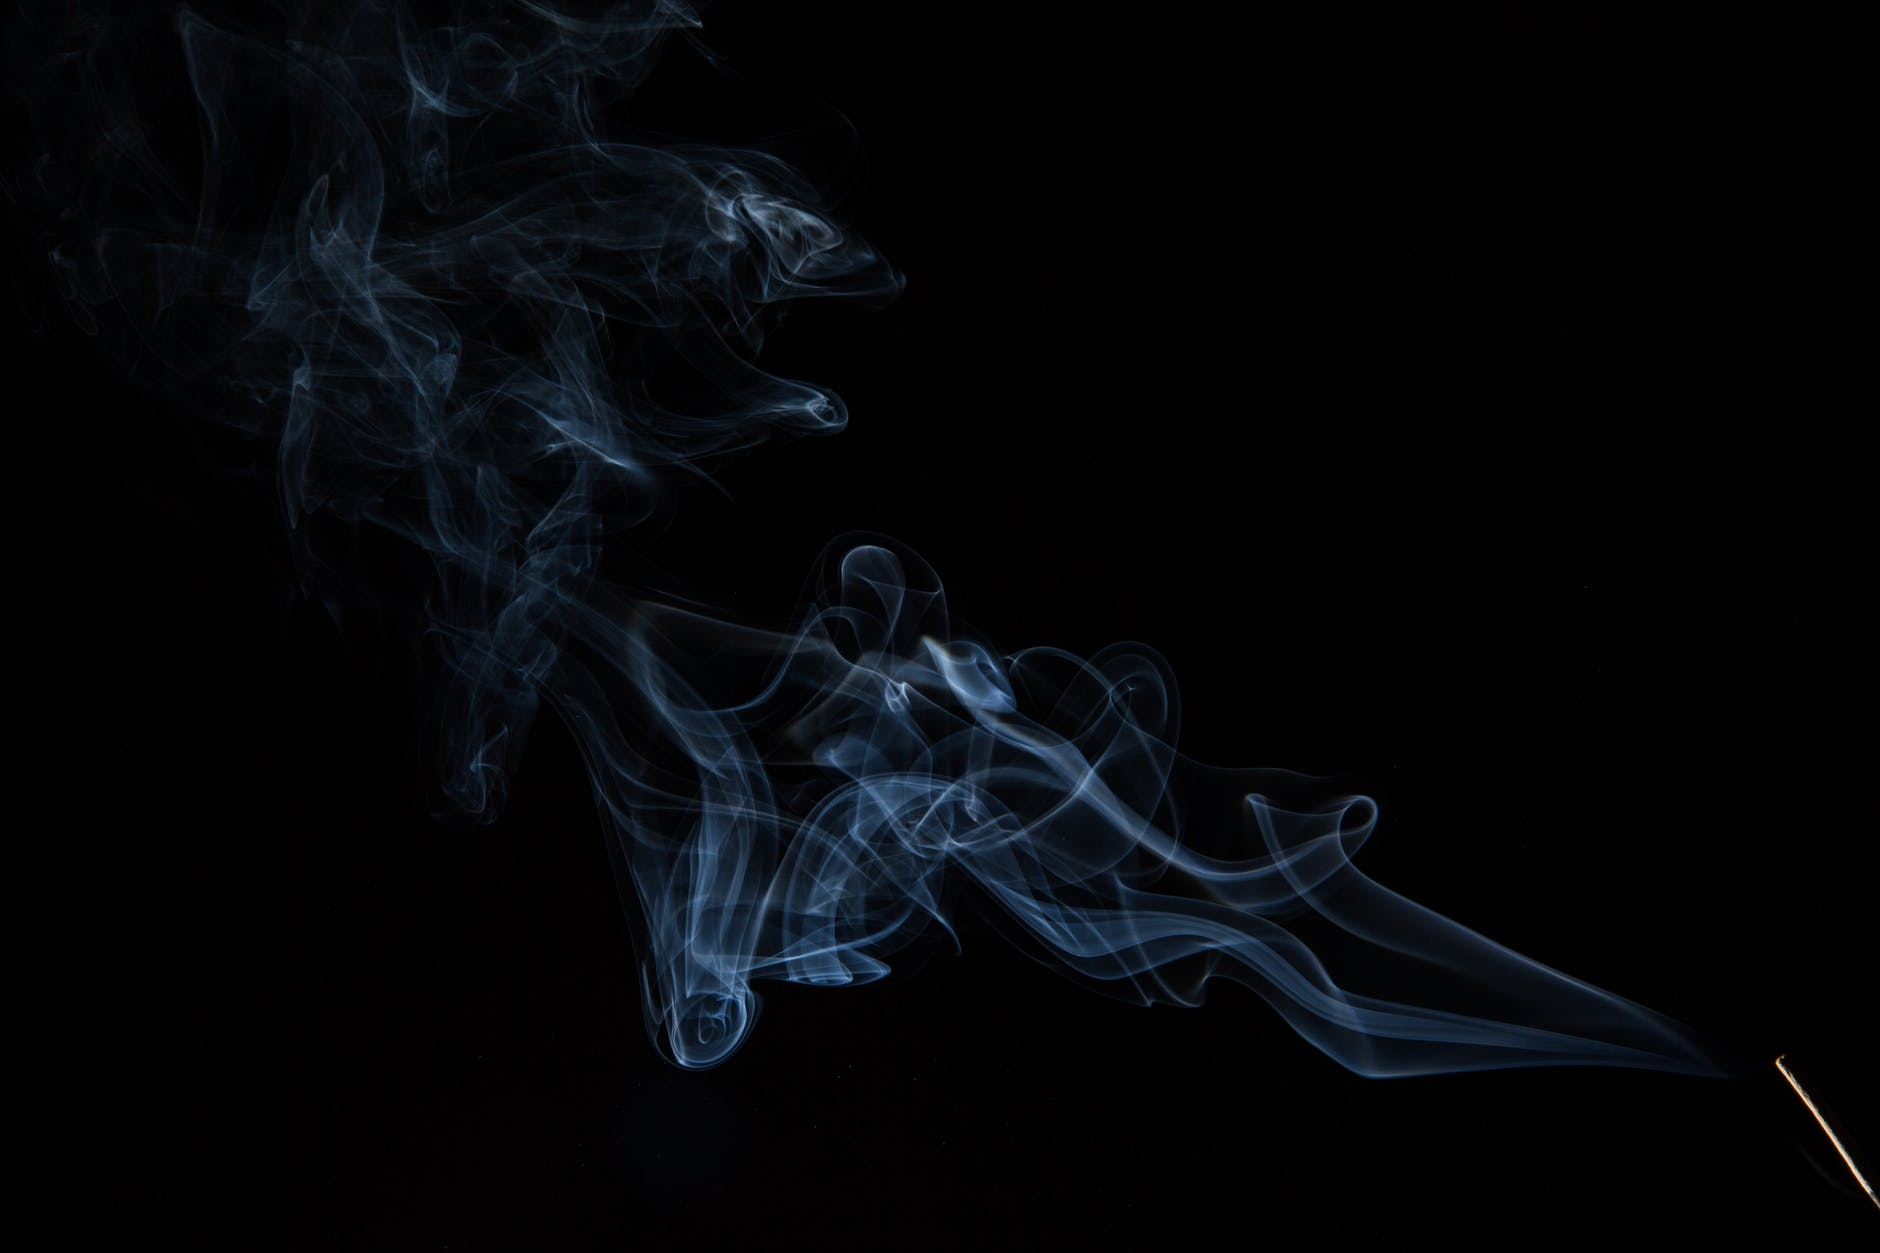 Тьма в картинках Non-incense-smell-dark-52732